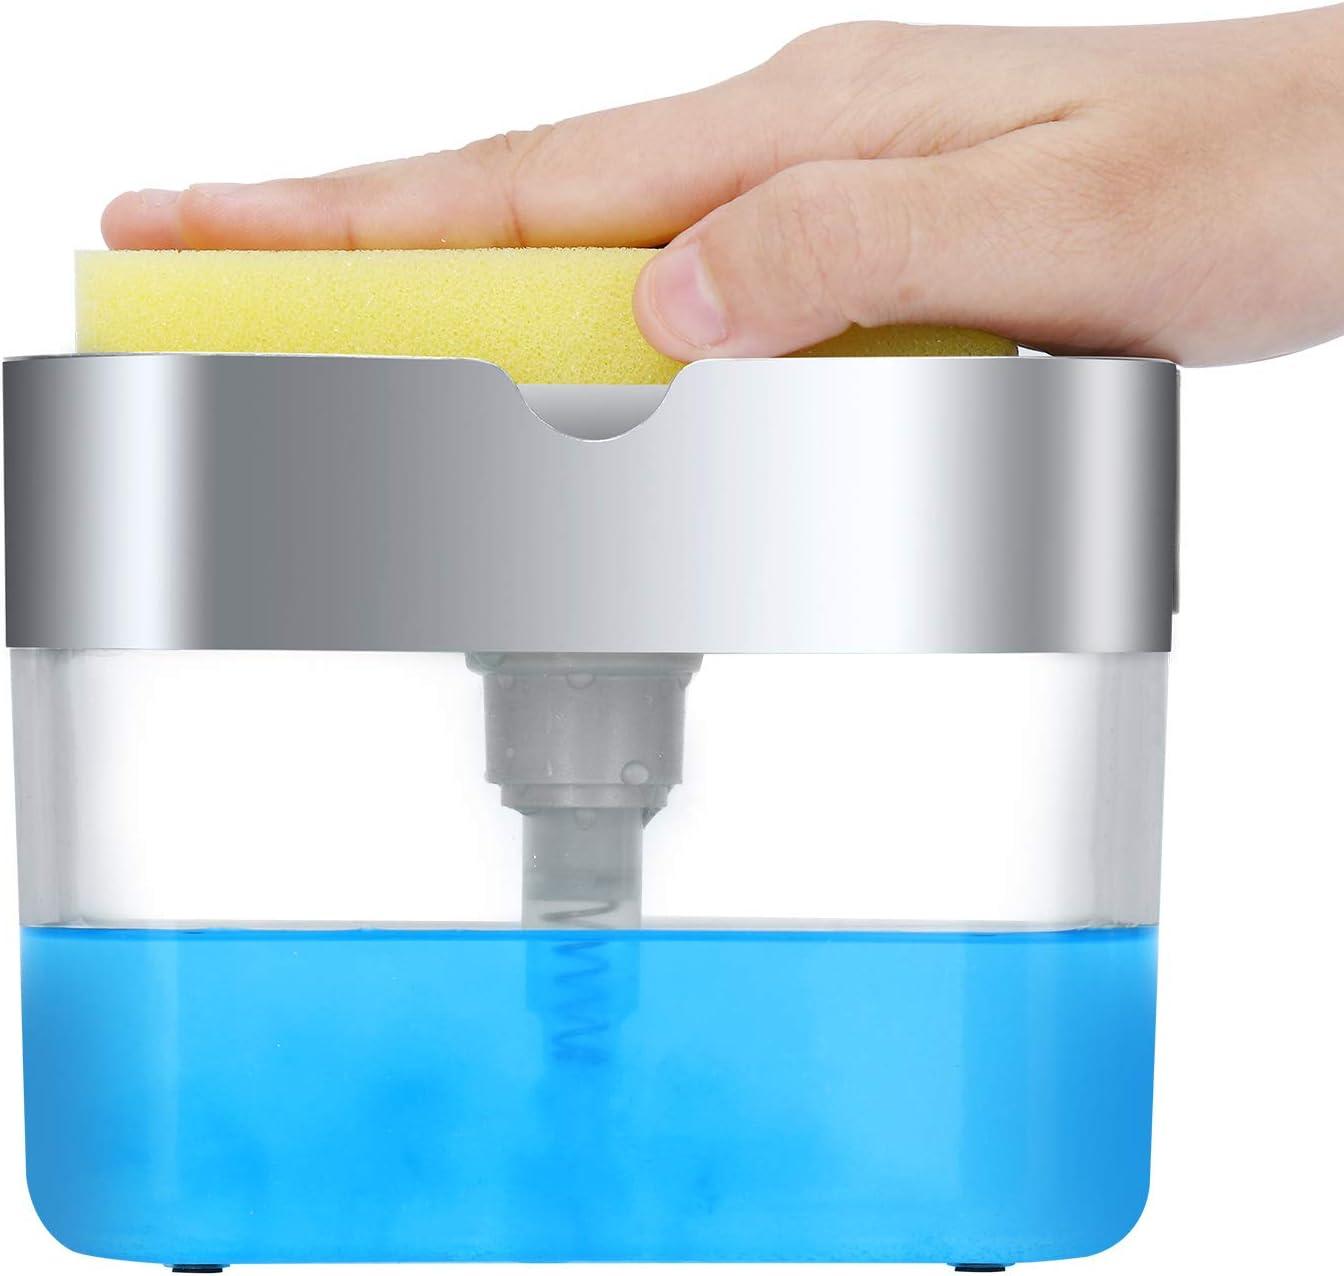 Dispenser de detergente 2 en 1 para esponja